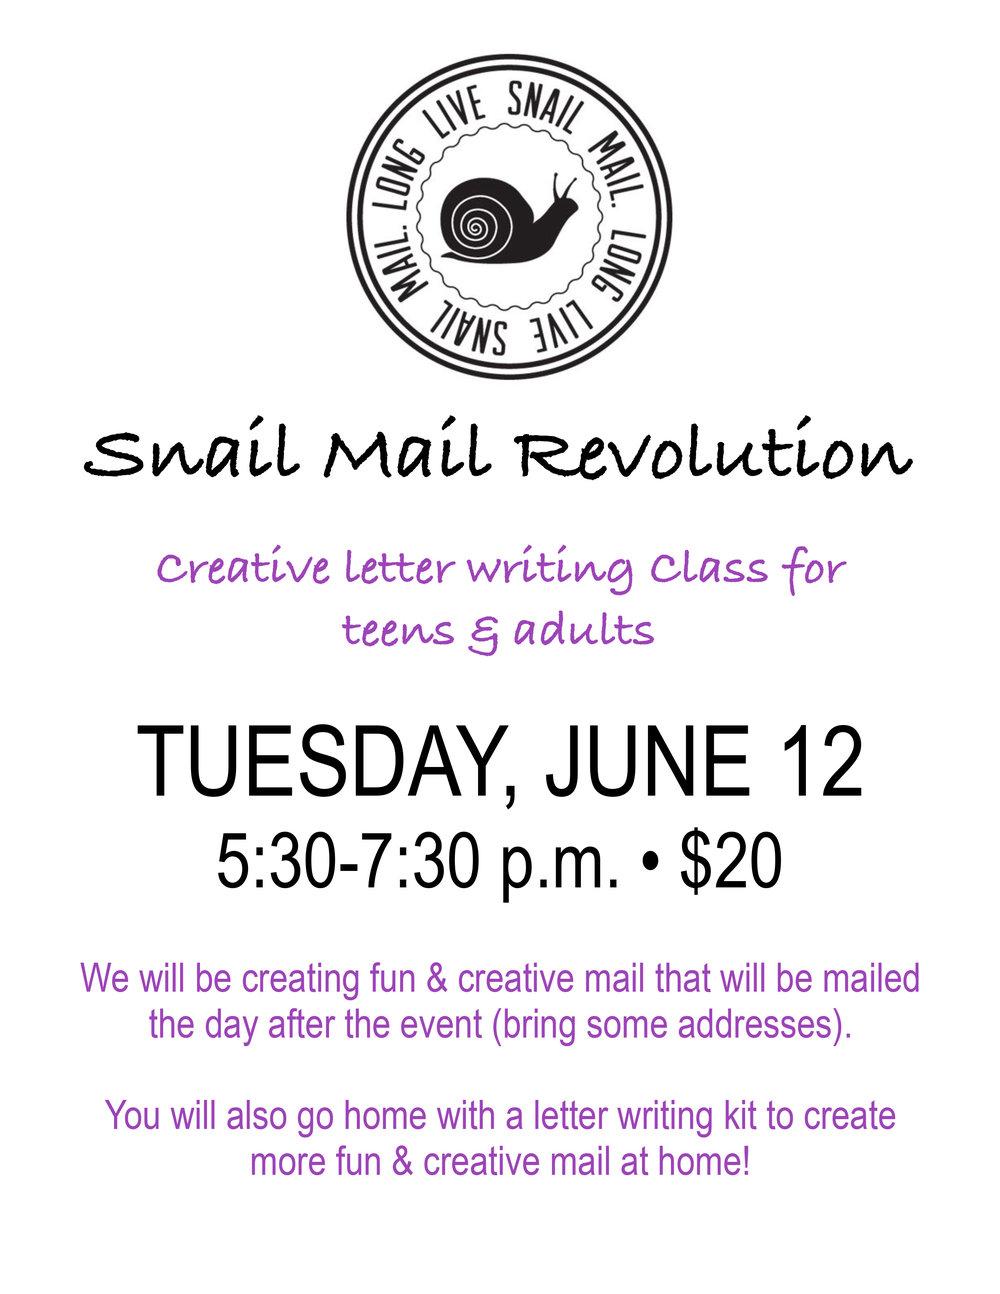 Snail Mail June 12